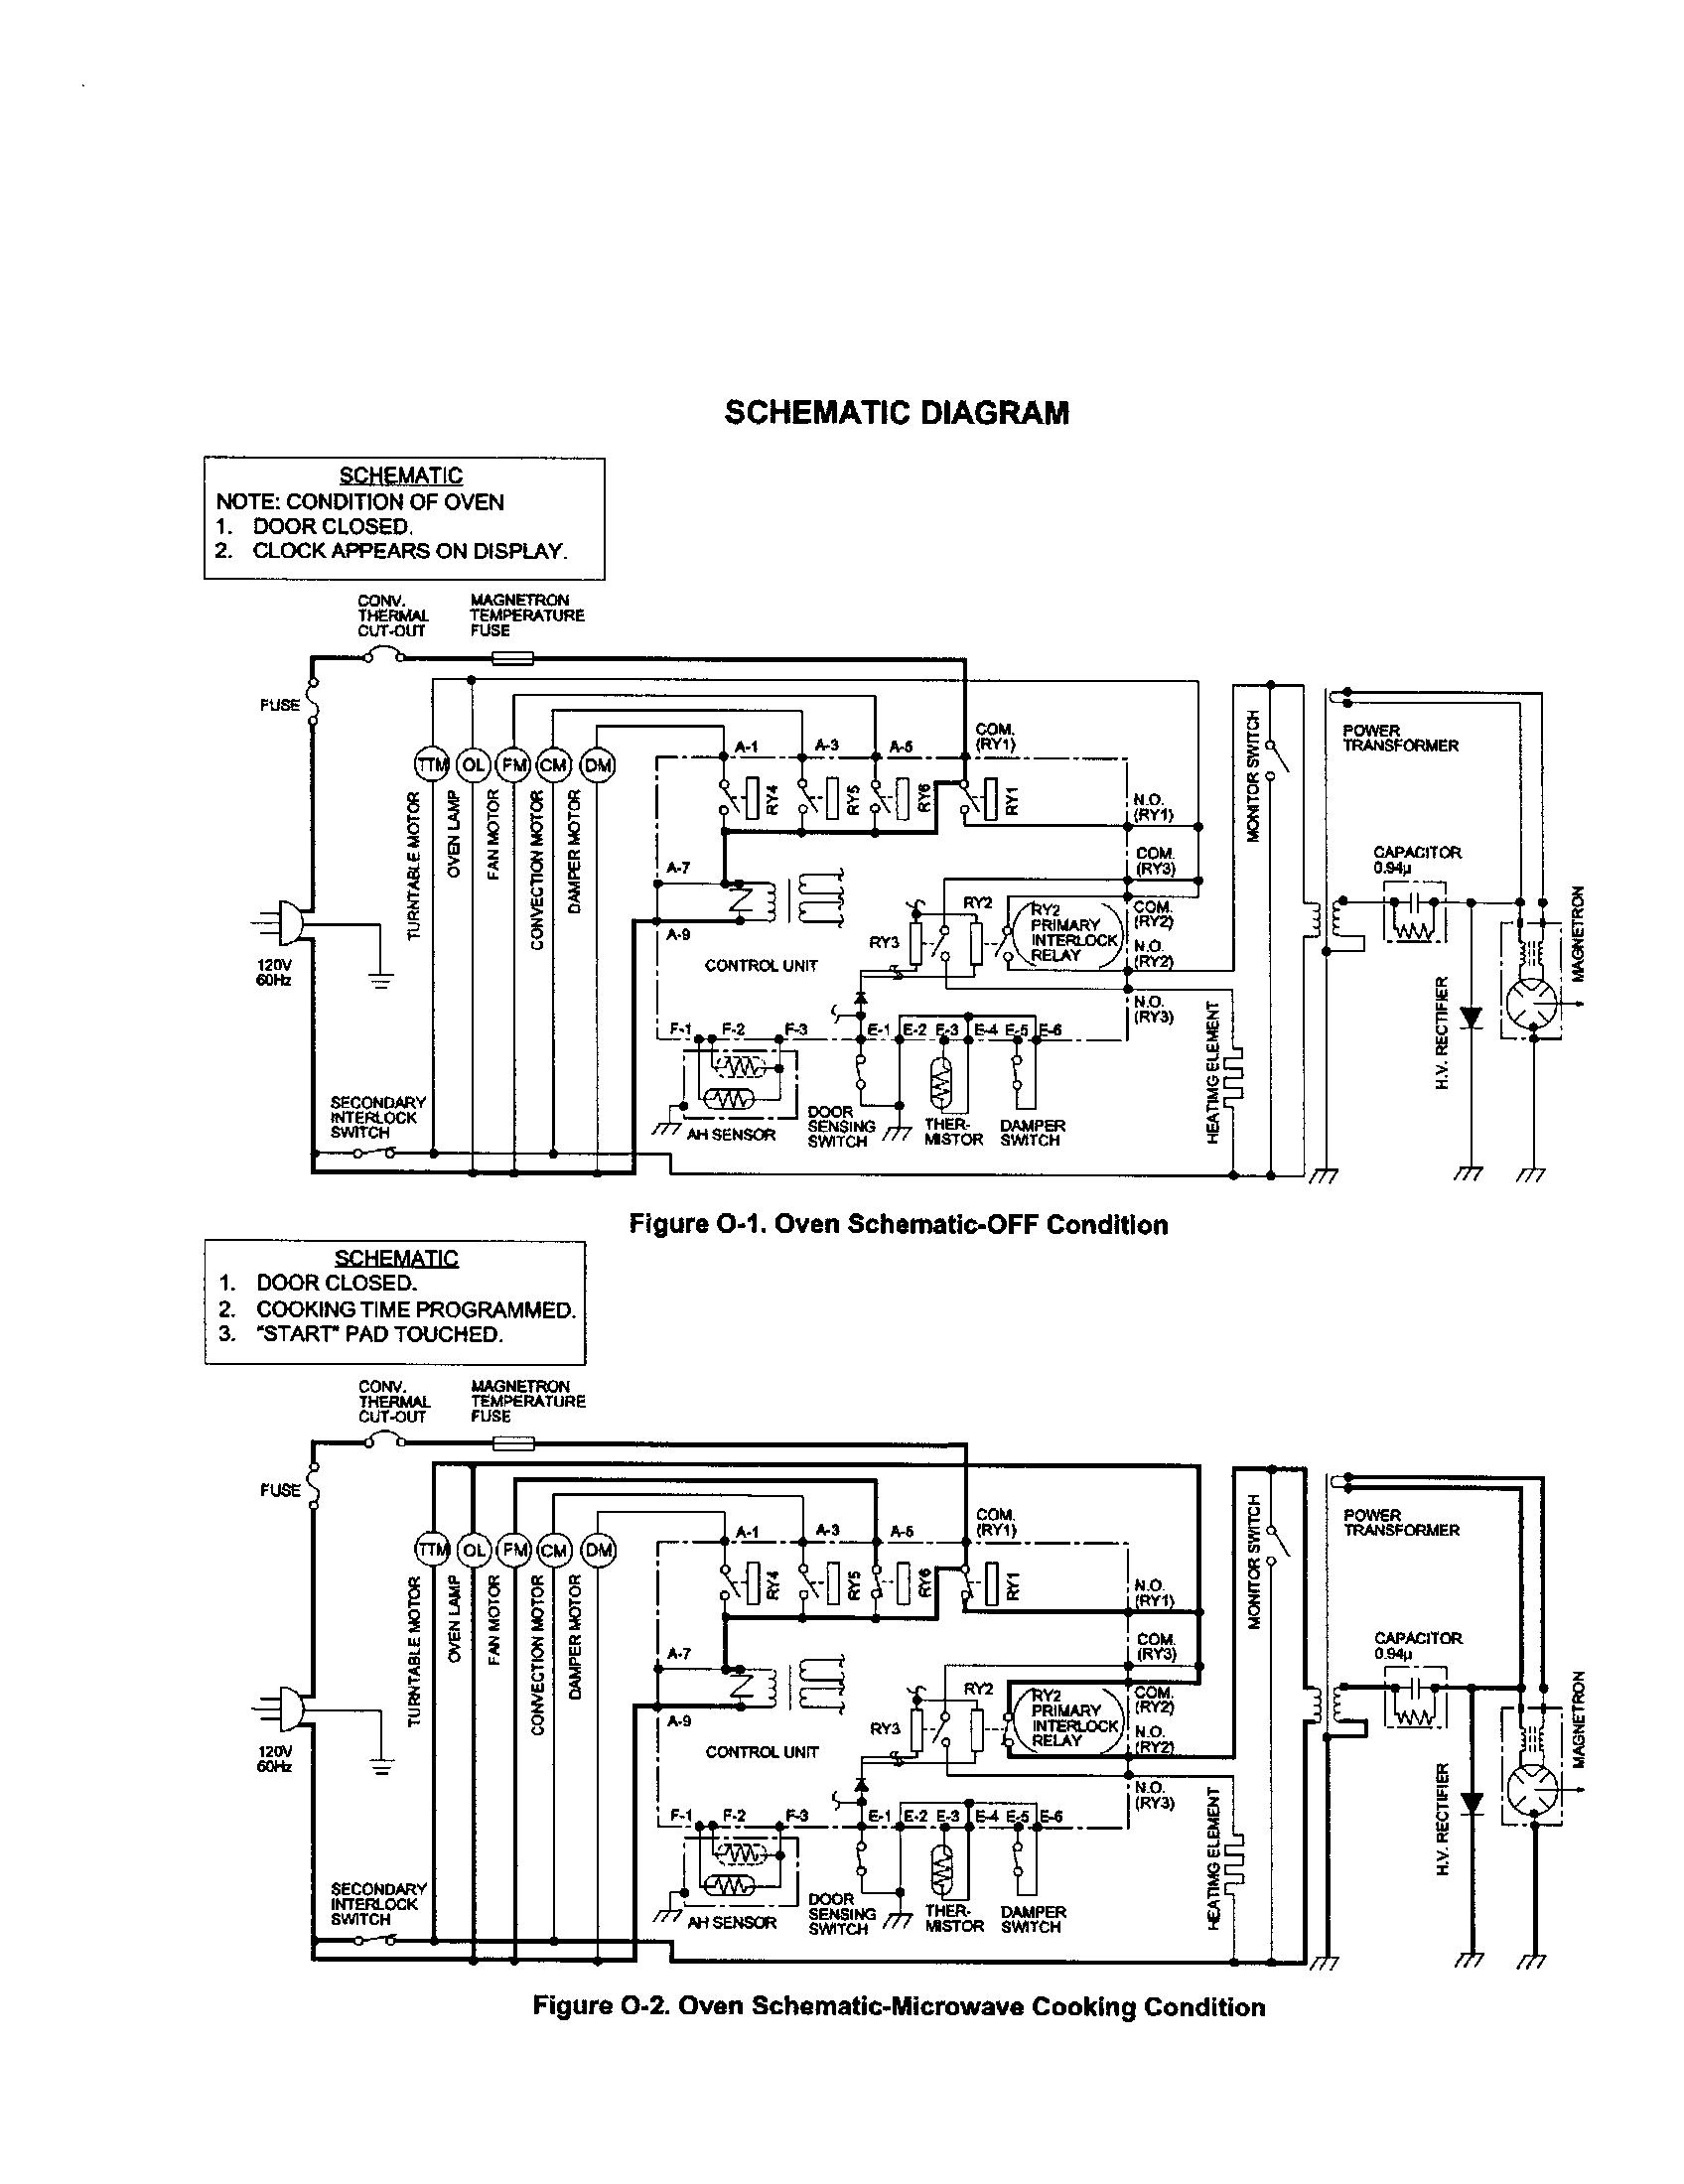 Sharp model R-930CS countertop microwave genuine parts